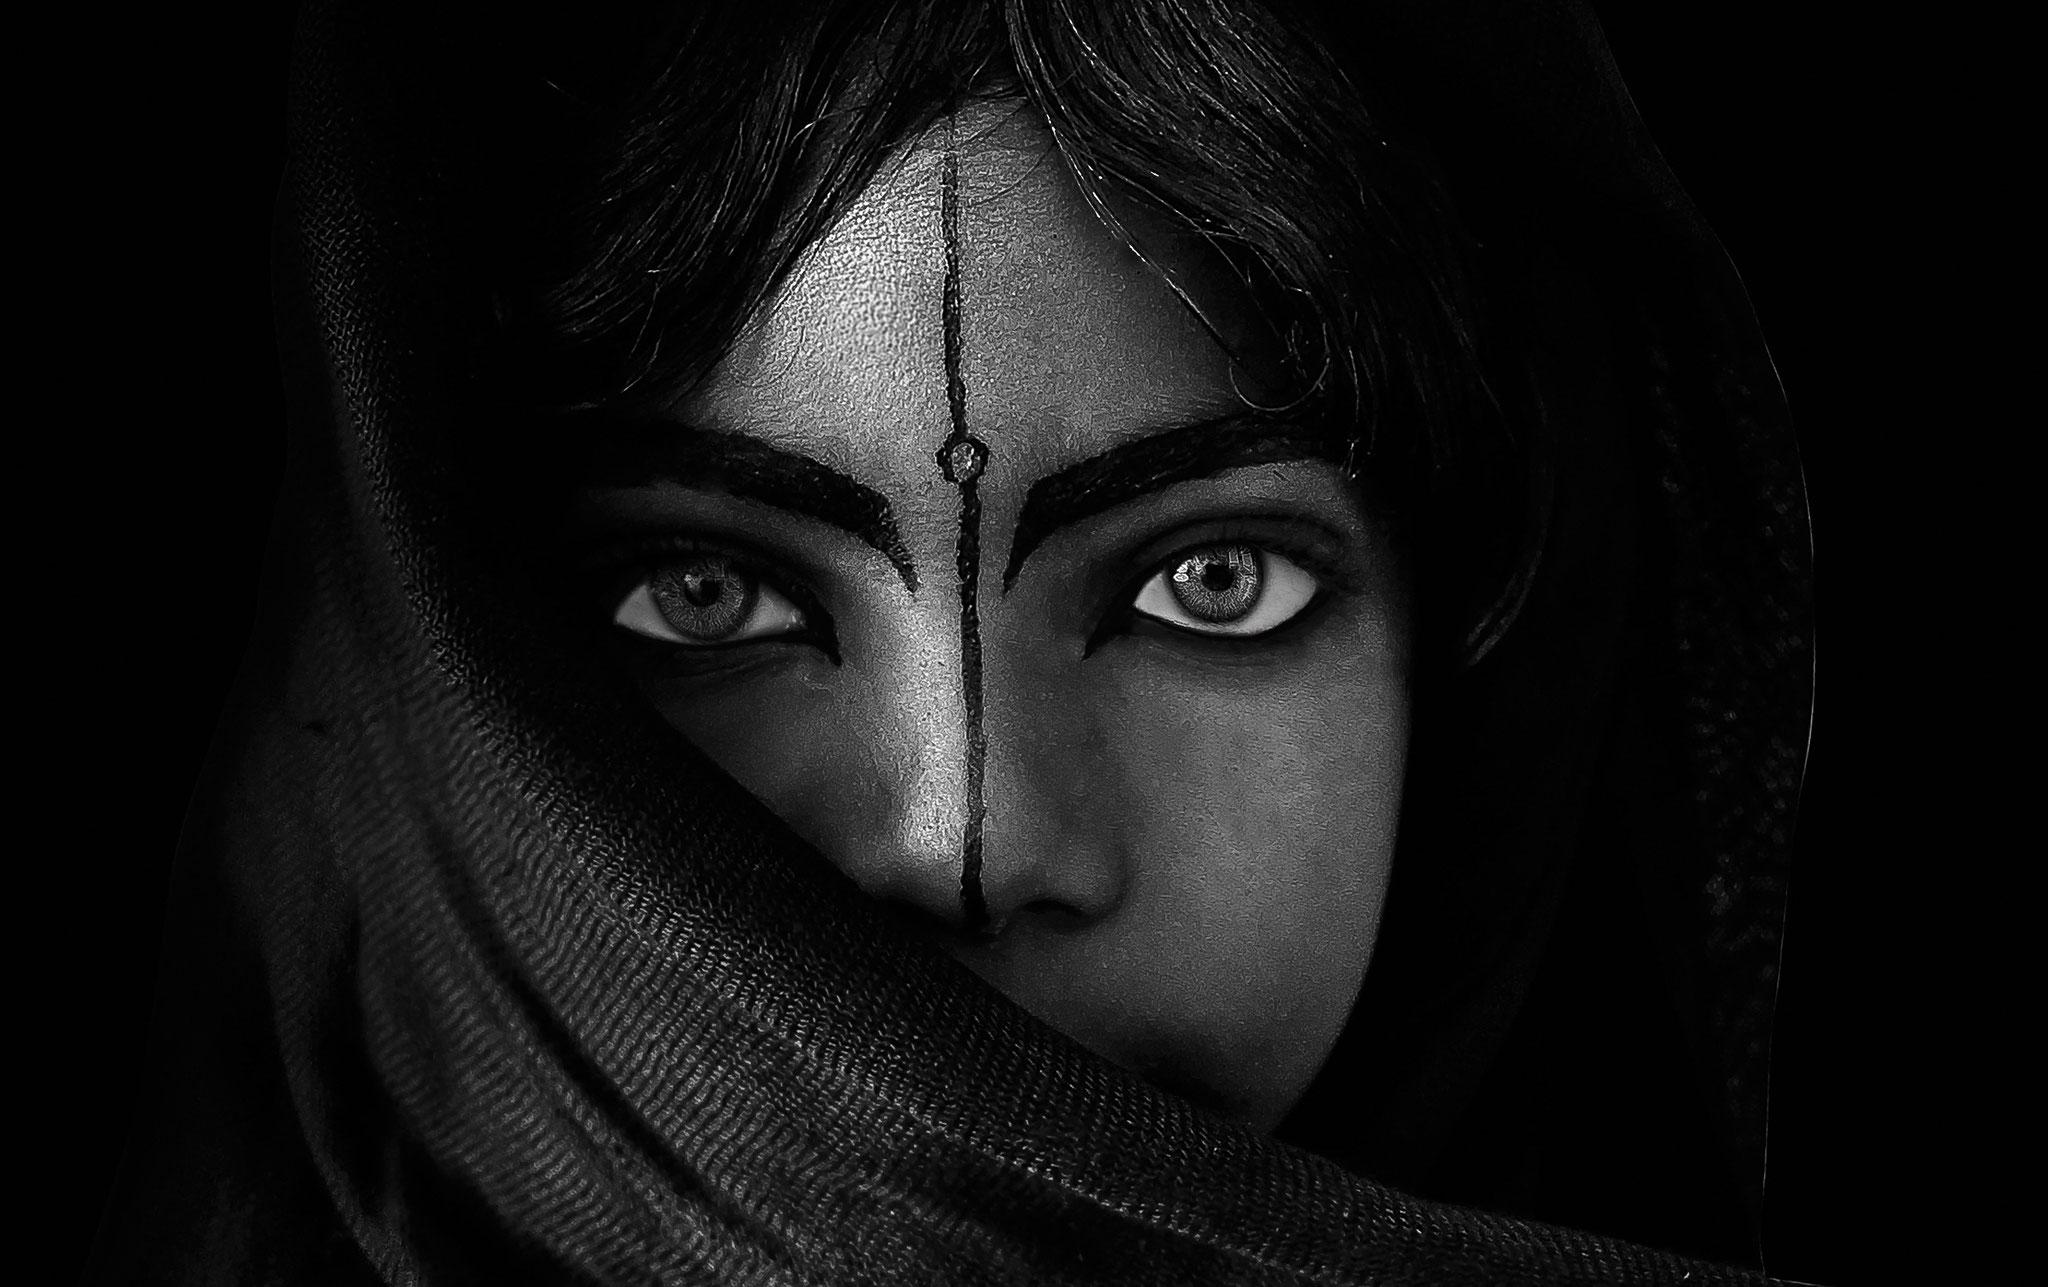 Abdullah Othman (Yemen) - Hadrami tradition